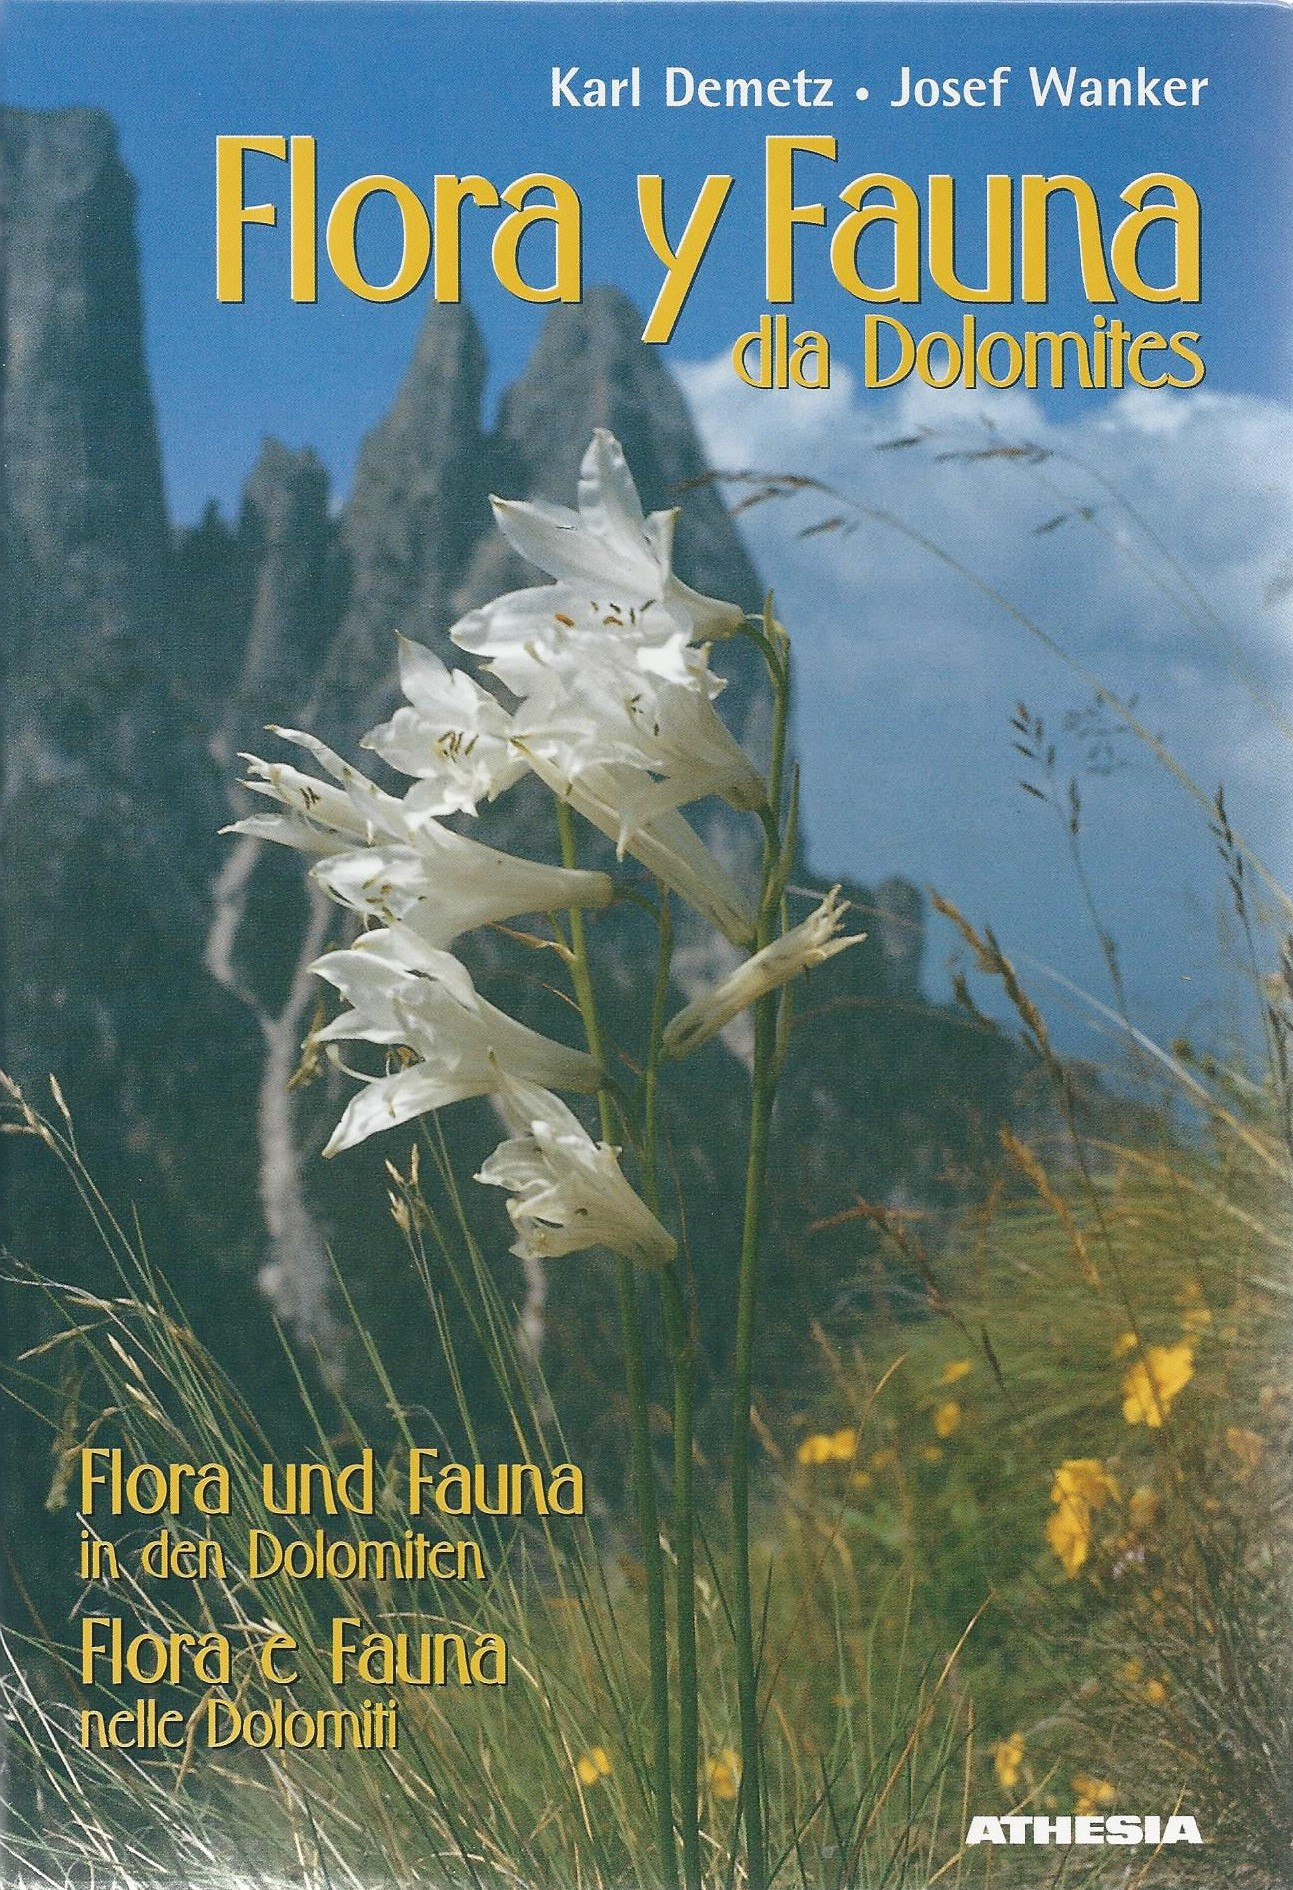 Flora y Fauna dla Dolomites, Karl Demetz, Josef Wanker